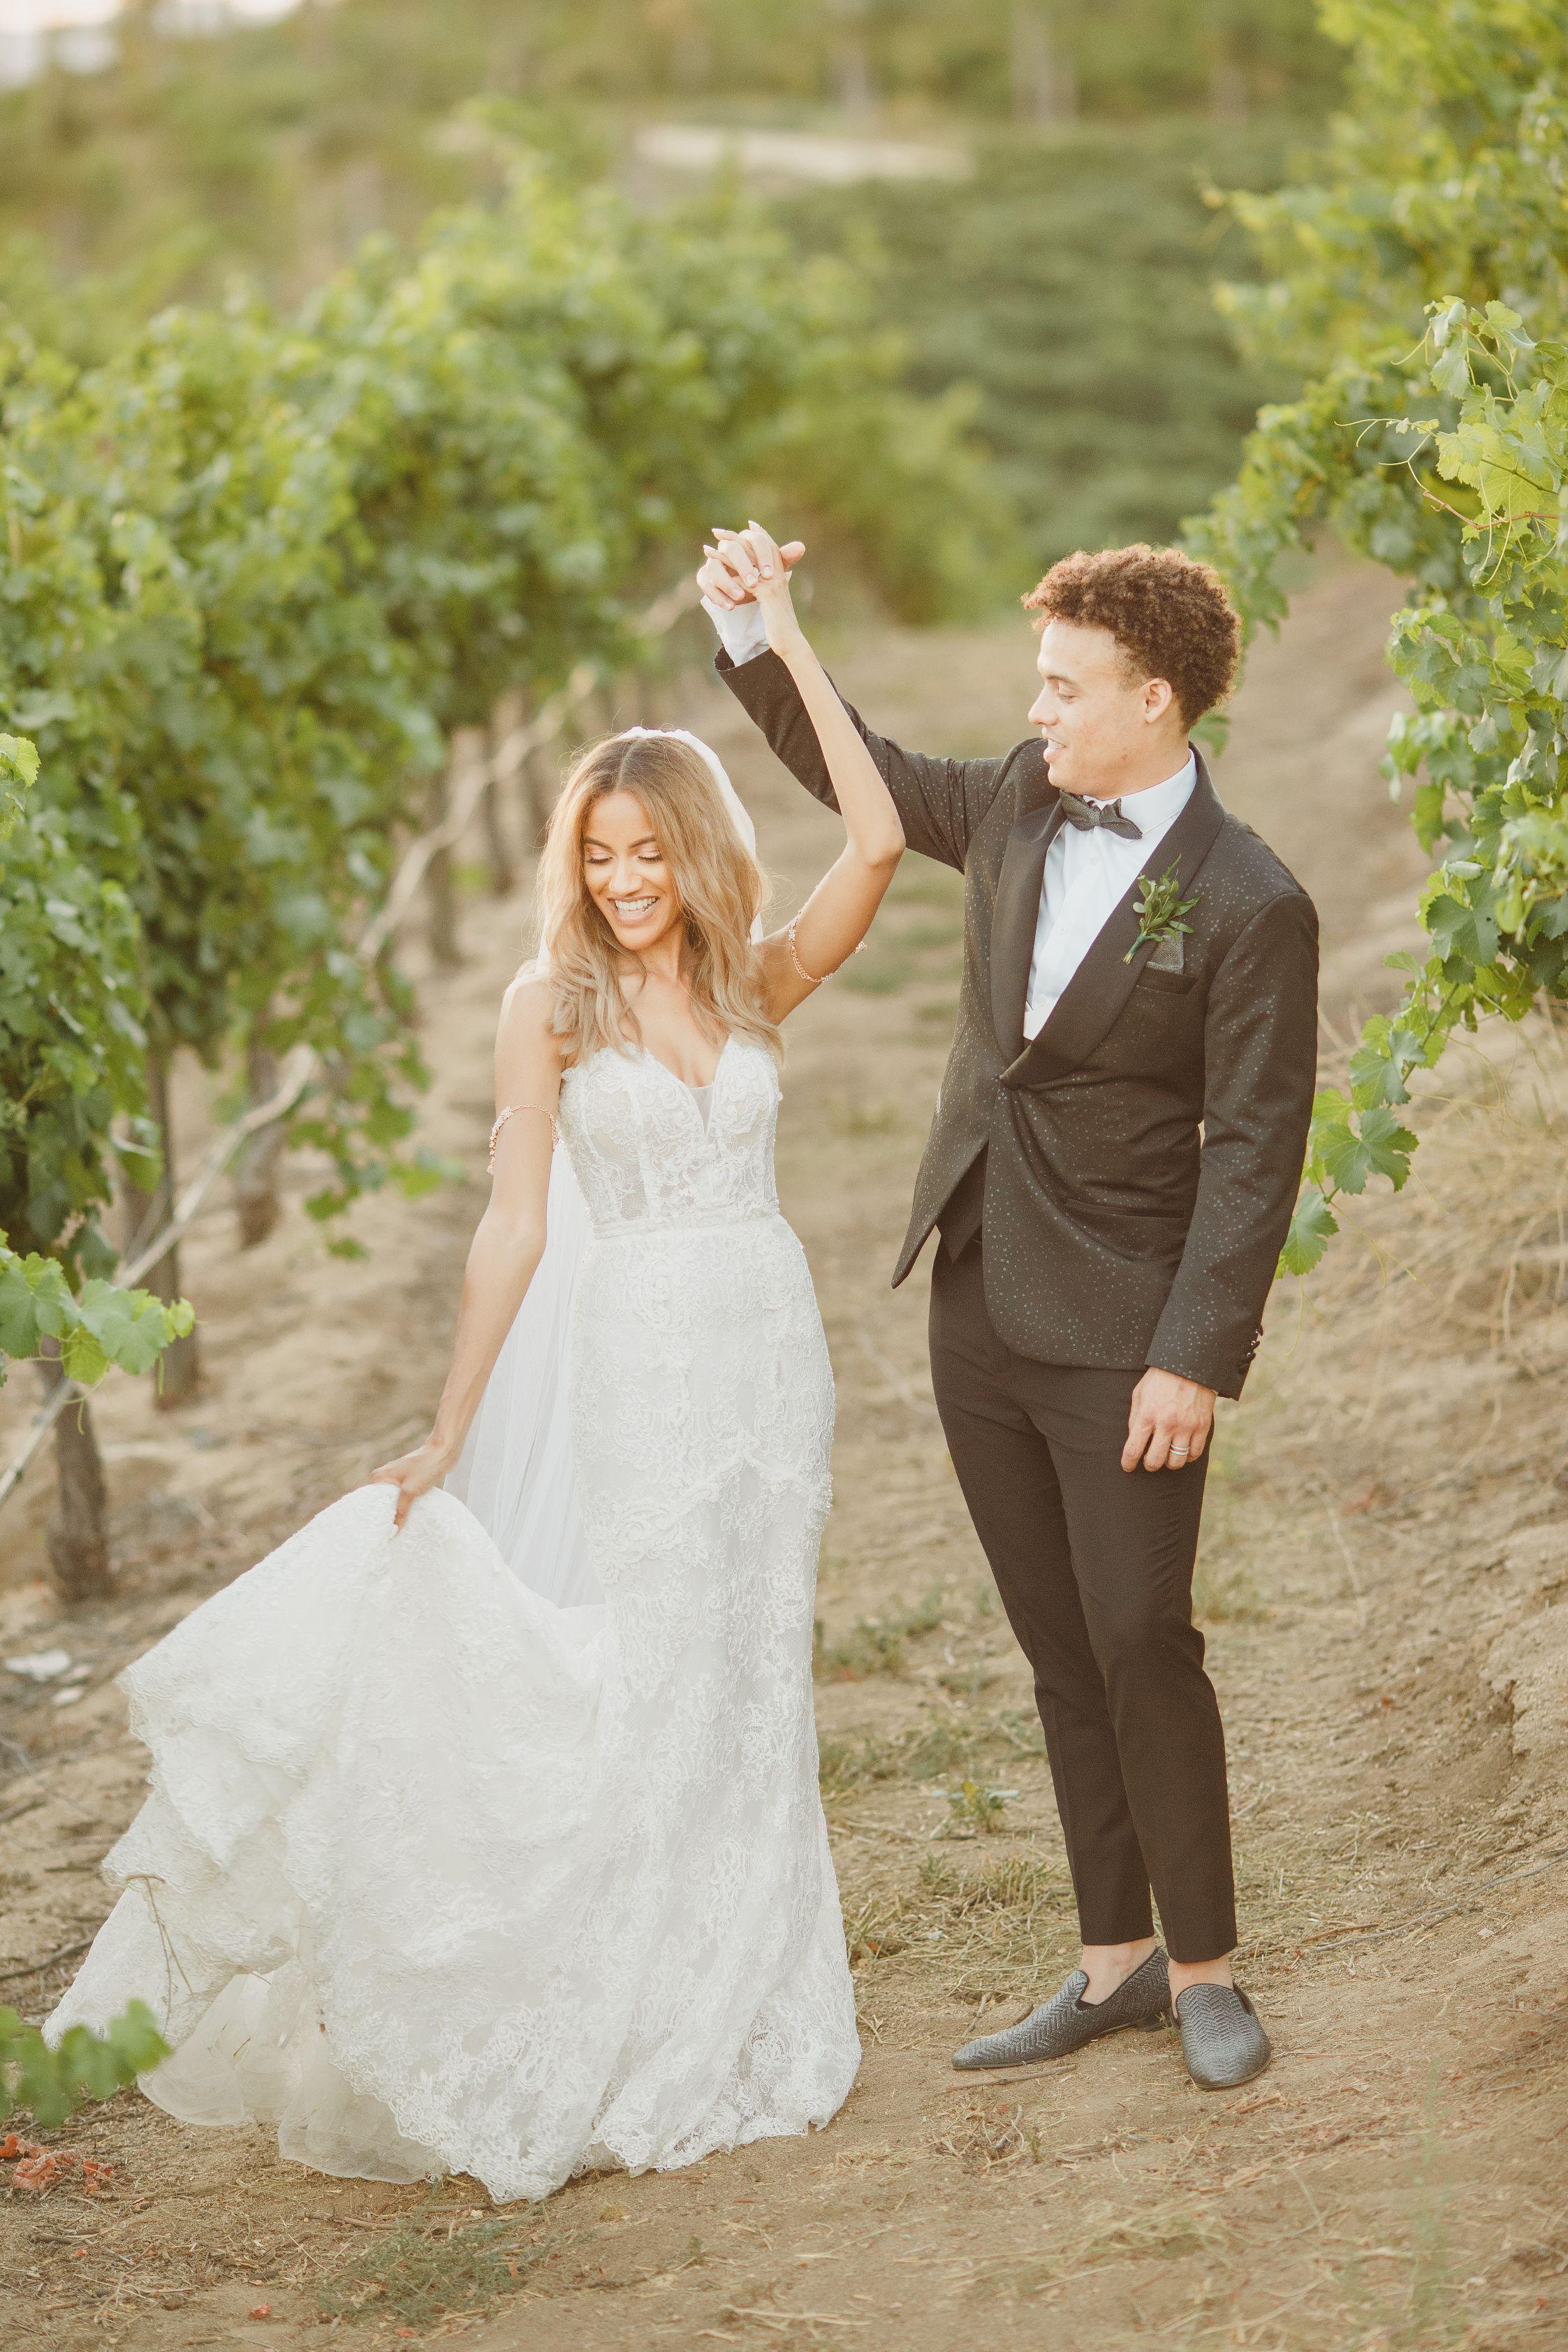 Falkner winery wedding photos in 2020 winery wedding